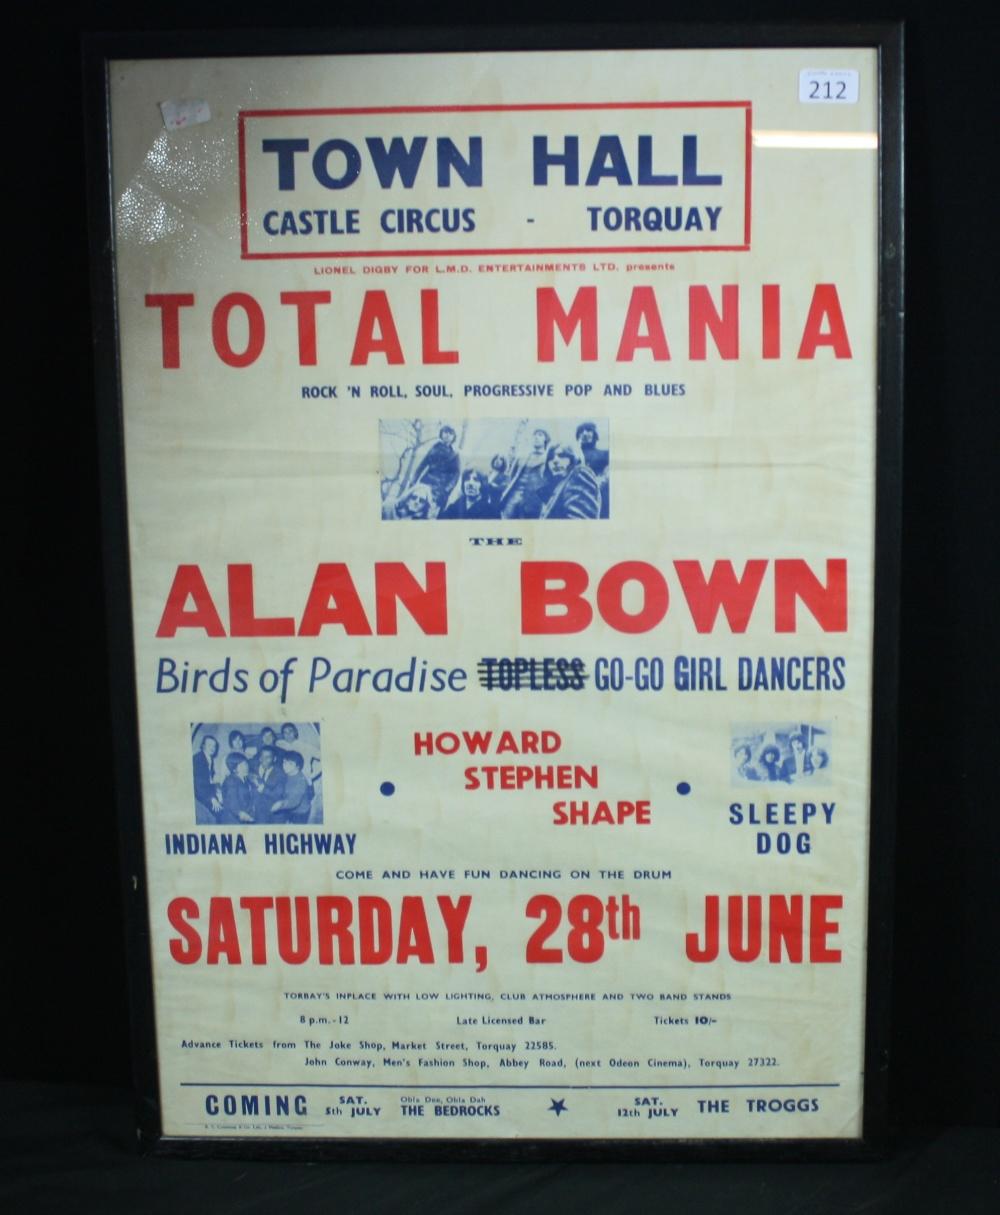 Lot 212 - CONCERT POSTER - Original framed concert poster for `Town Hall - Castle Circus - Torquay`. Headline